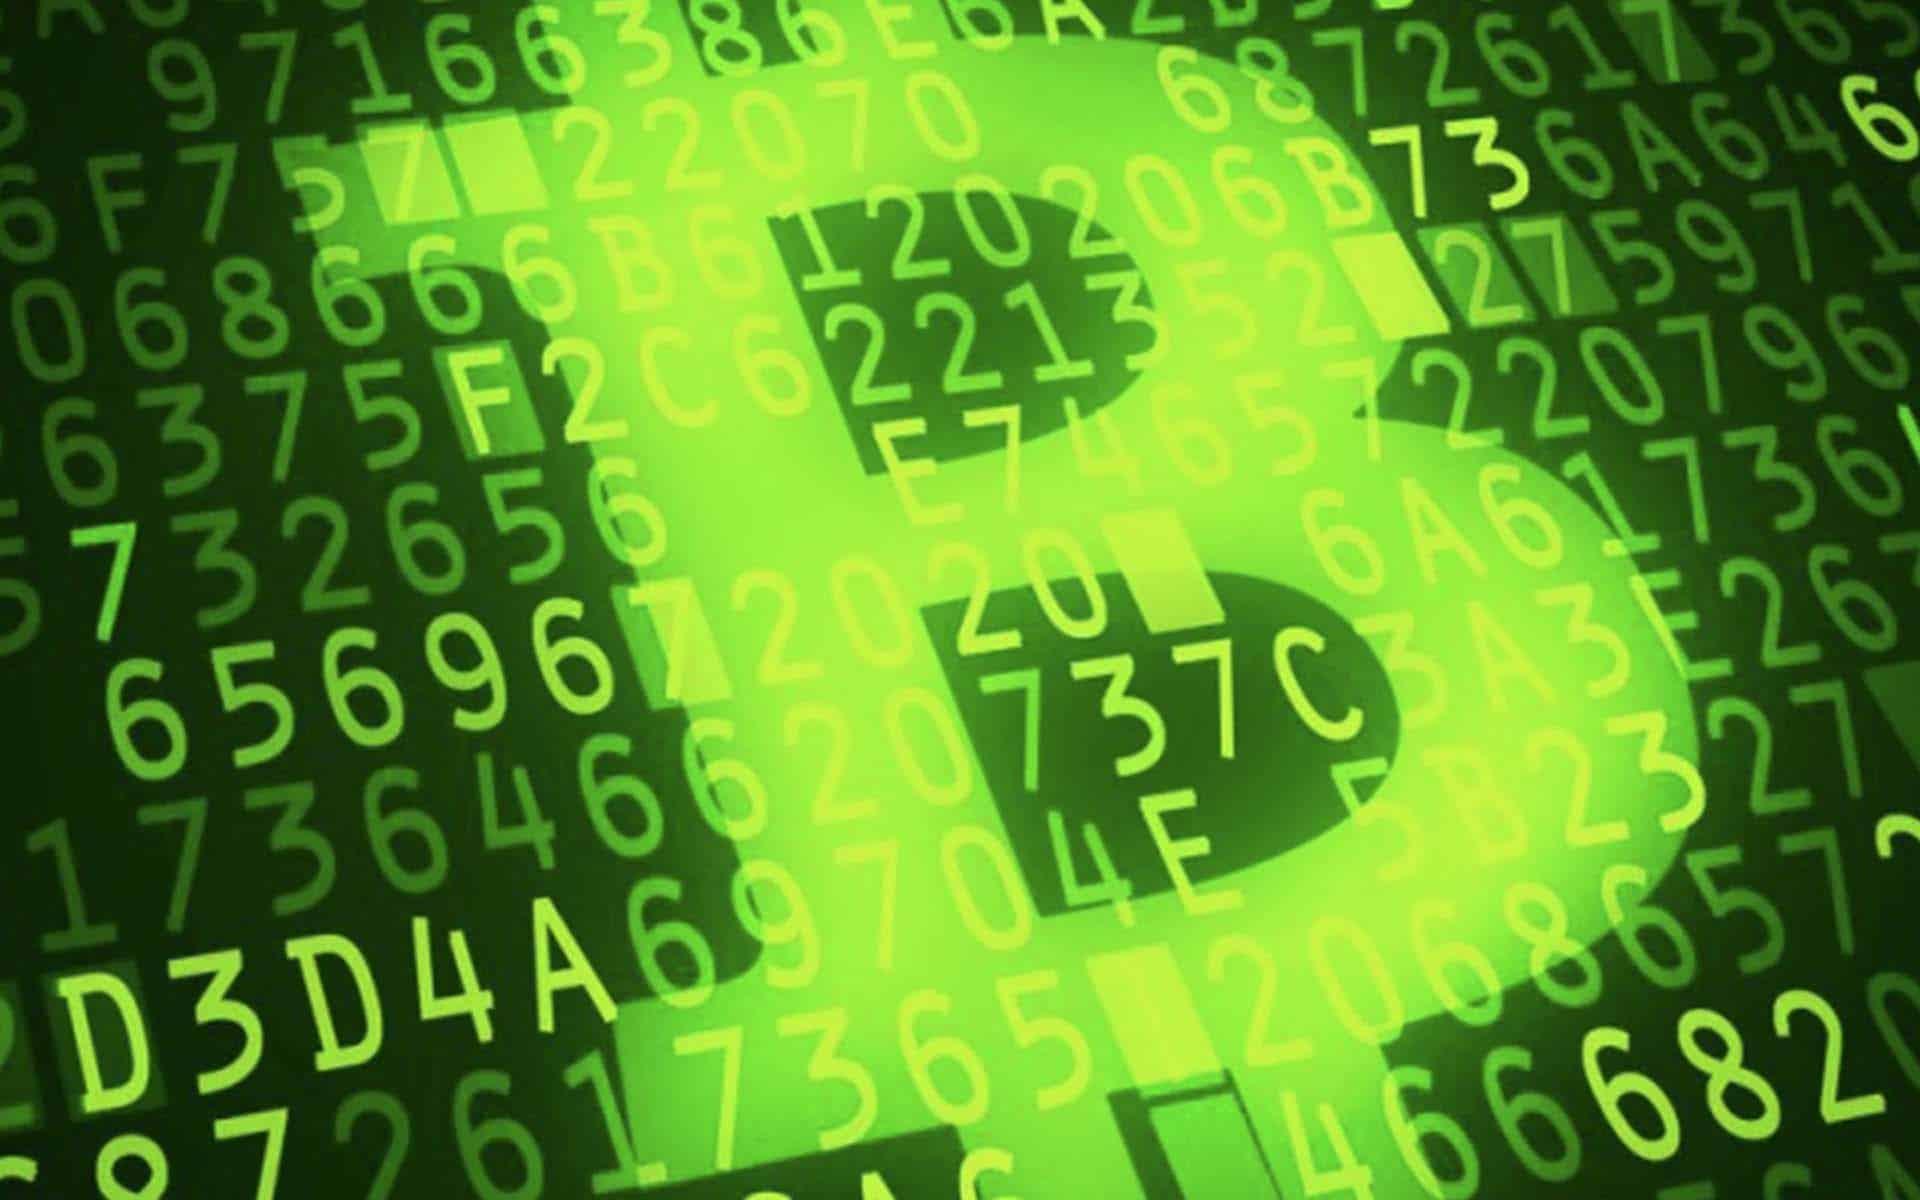 Bitcoin Cash Miners Launches A 51% Attack to Undo Attacker's Transactions